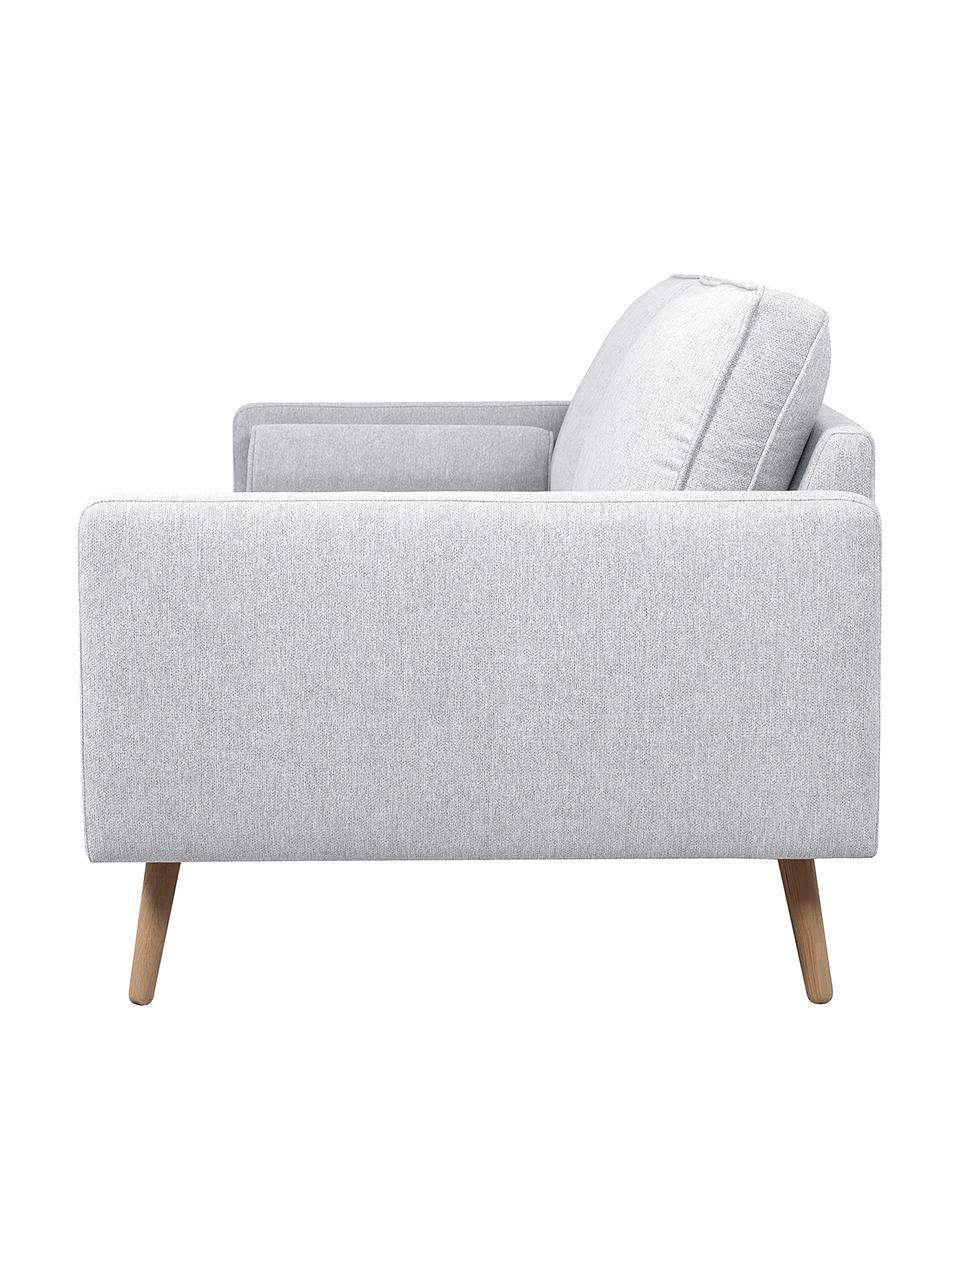 Sofa Saint (3-Sitzer) in Hellgrau mit Eichenholz-Füßen, Bezug: Polyester Der hochwertige, Gestell: Massives Kiefernholz, Spa, Webstoff Hellgrau, B 210 x T 93 cm